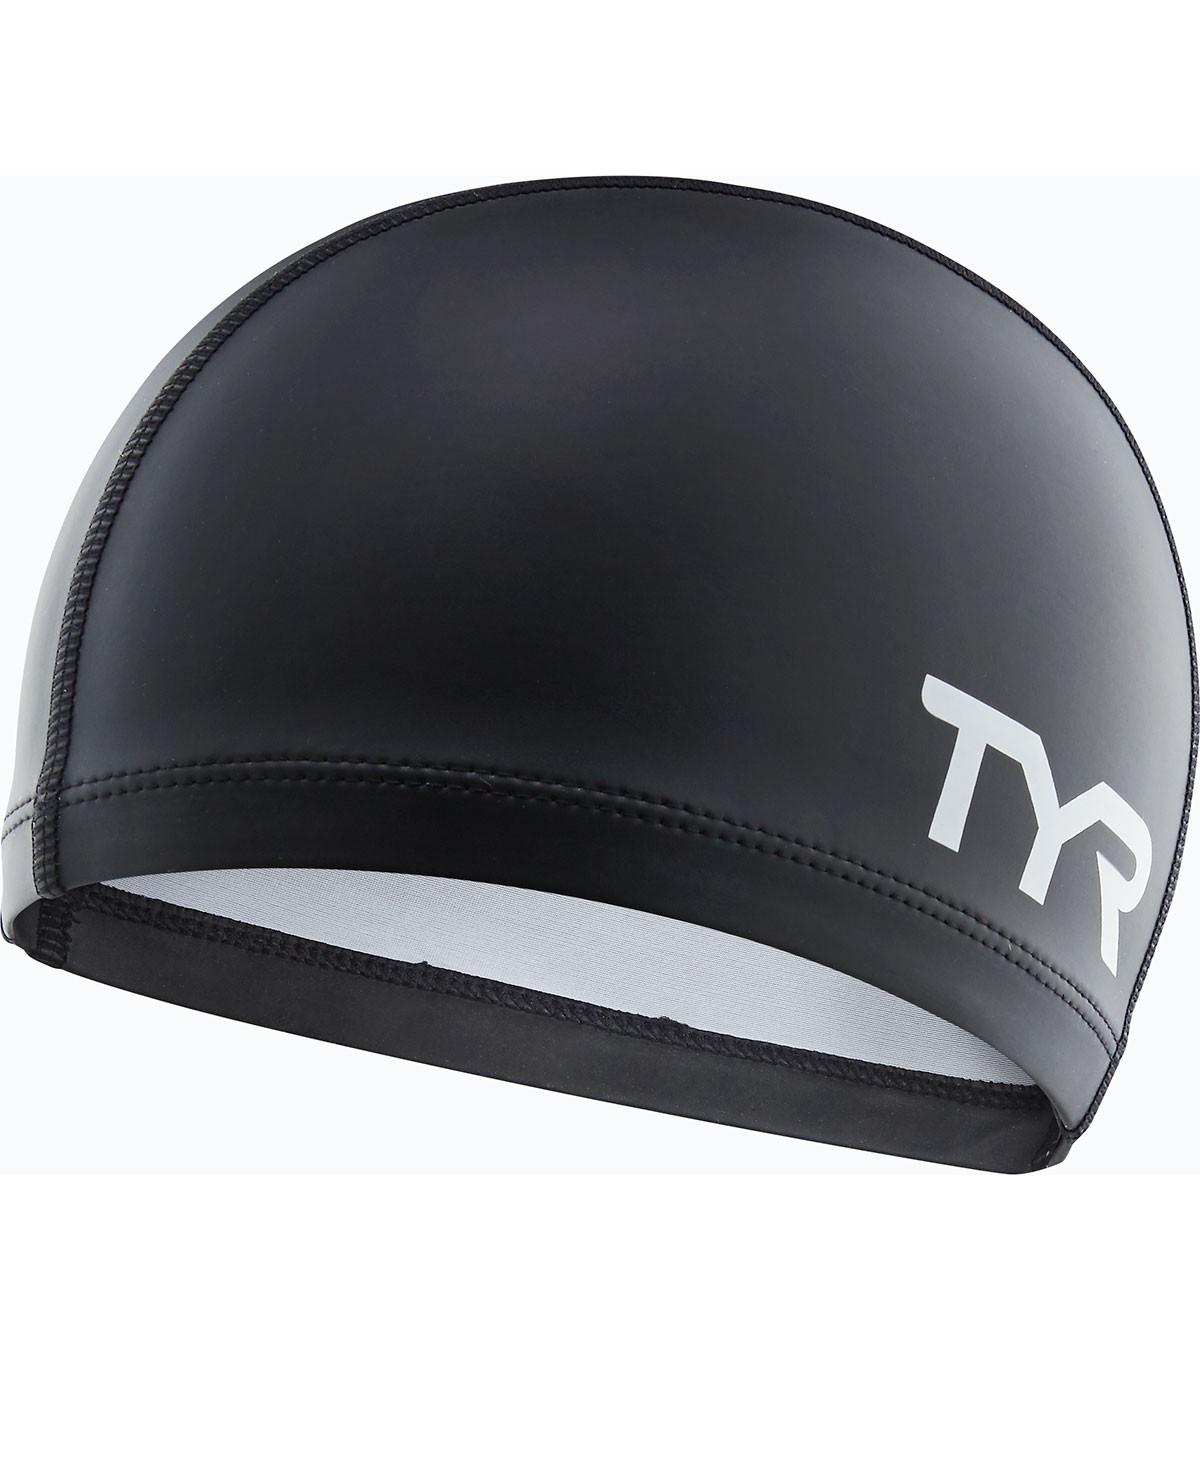 c9f38fa71c5126 TYR Silicone Comfort Adult Swim Cap   TYR